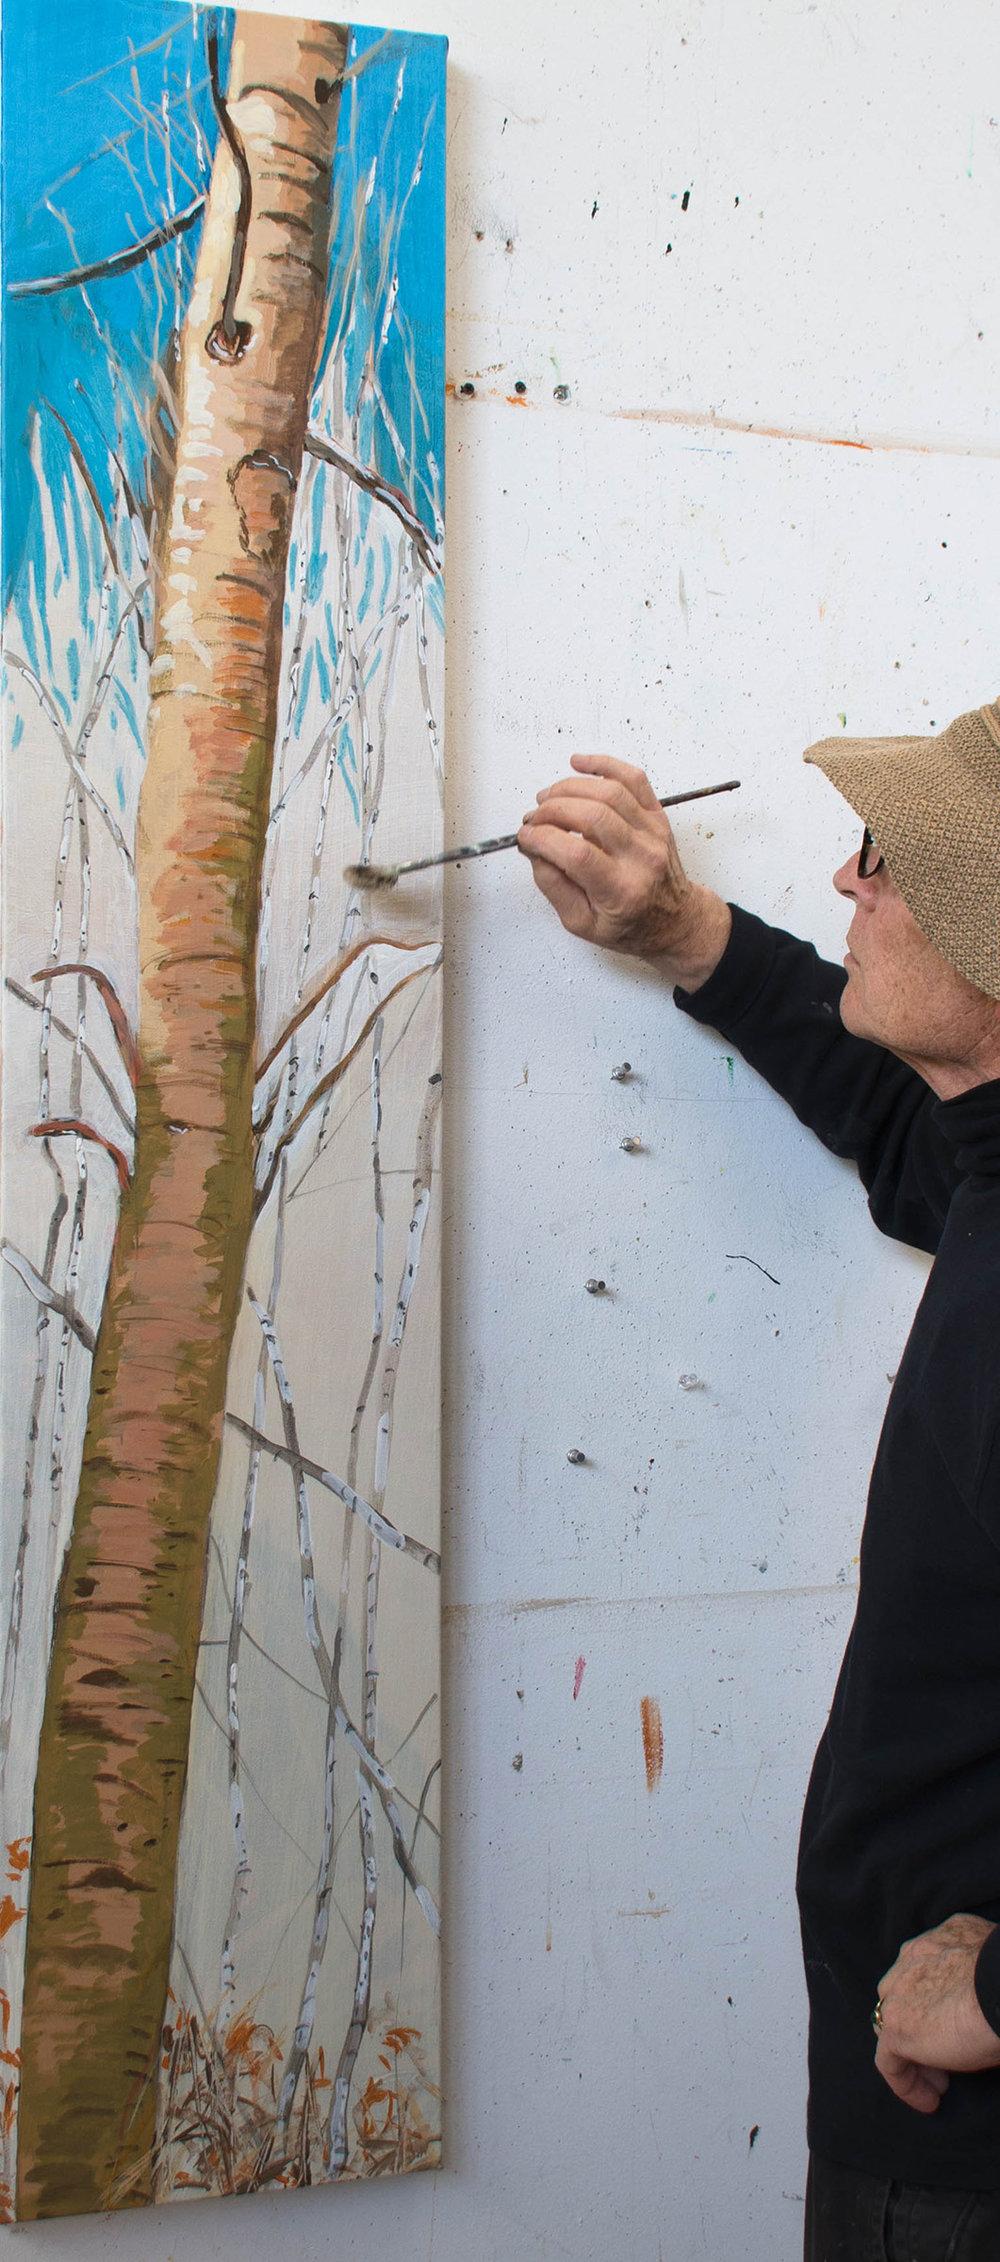 SITE-11-1-17 PT paints tree 1 b.jpg